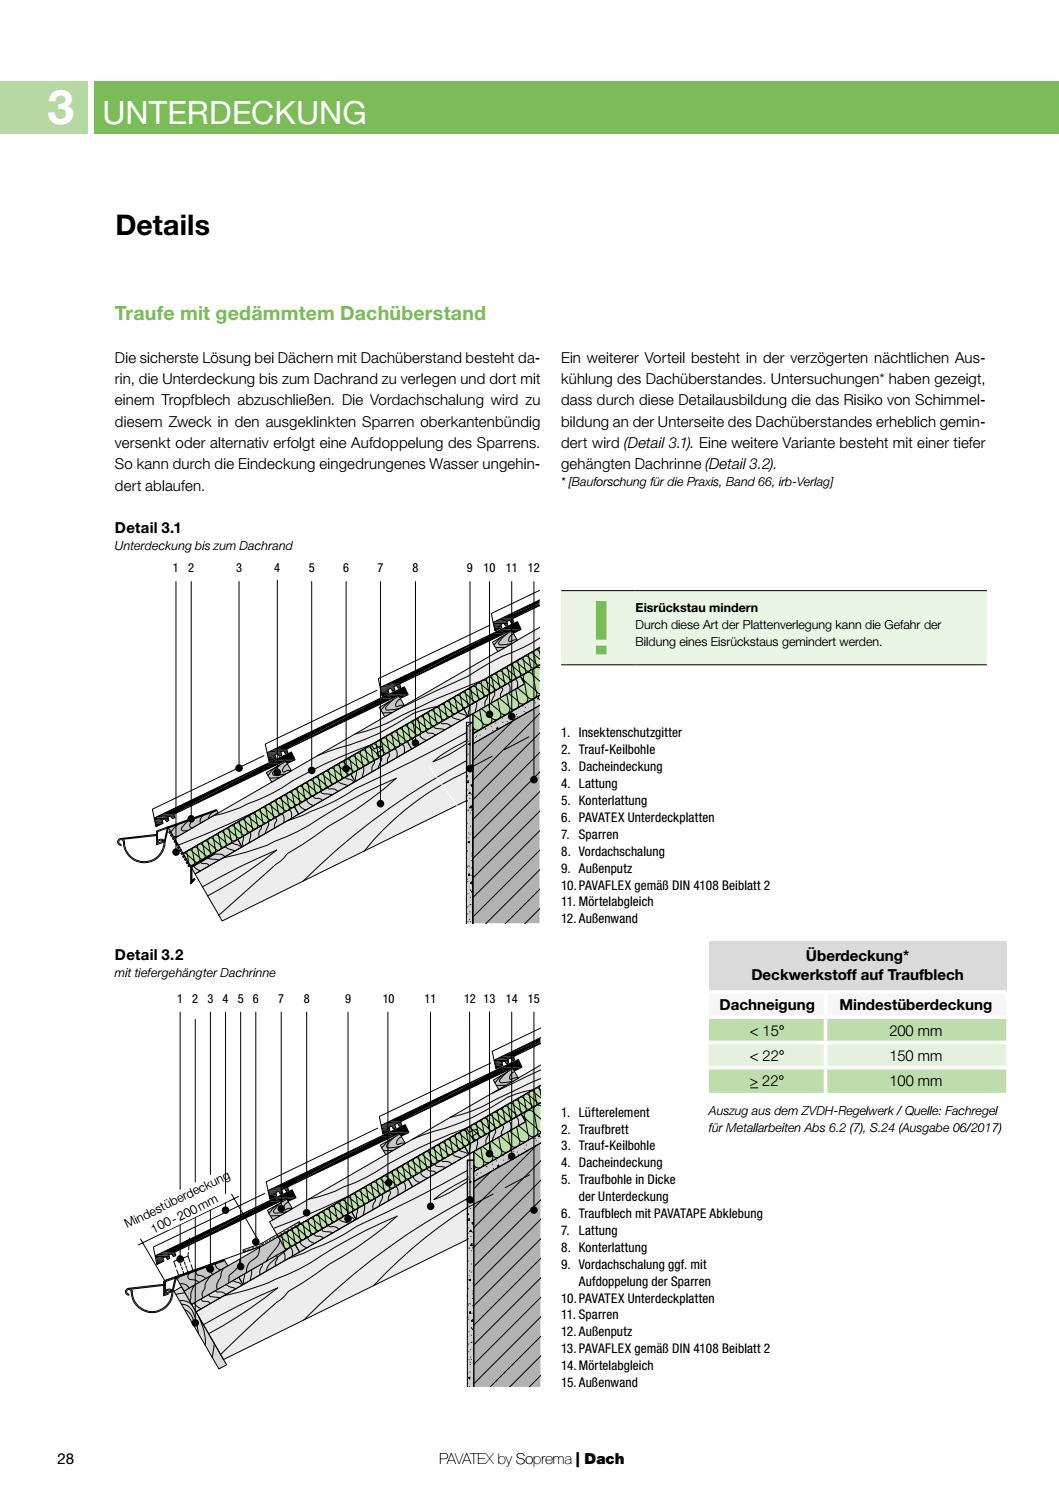 Top ecomat pavatex dak 18 (duits) by ecomat - issuu #IV_26